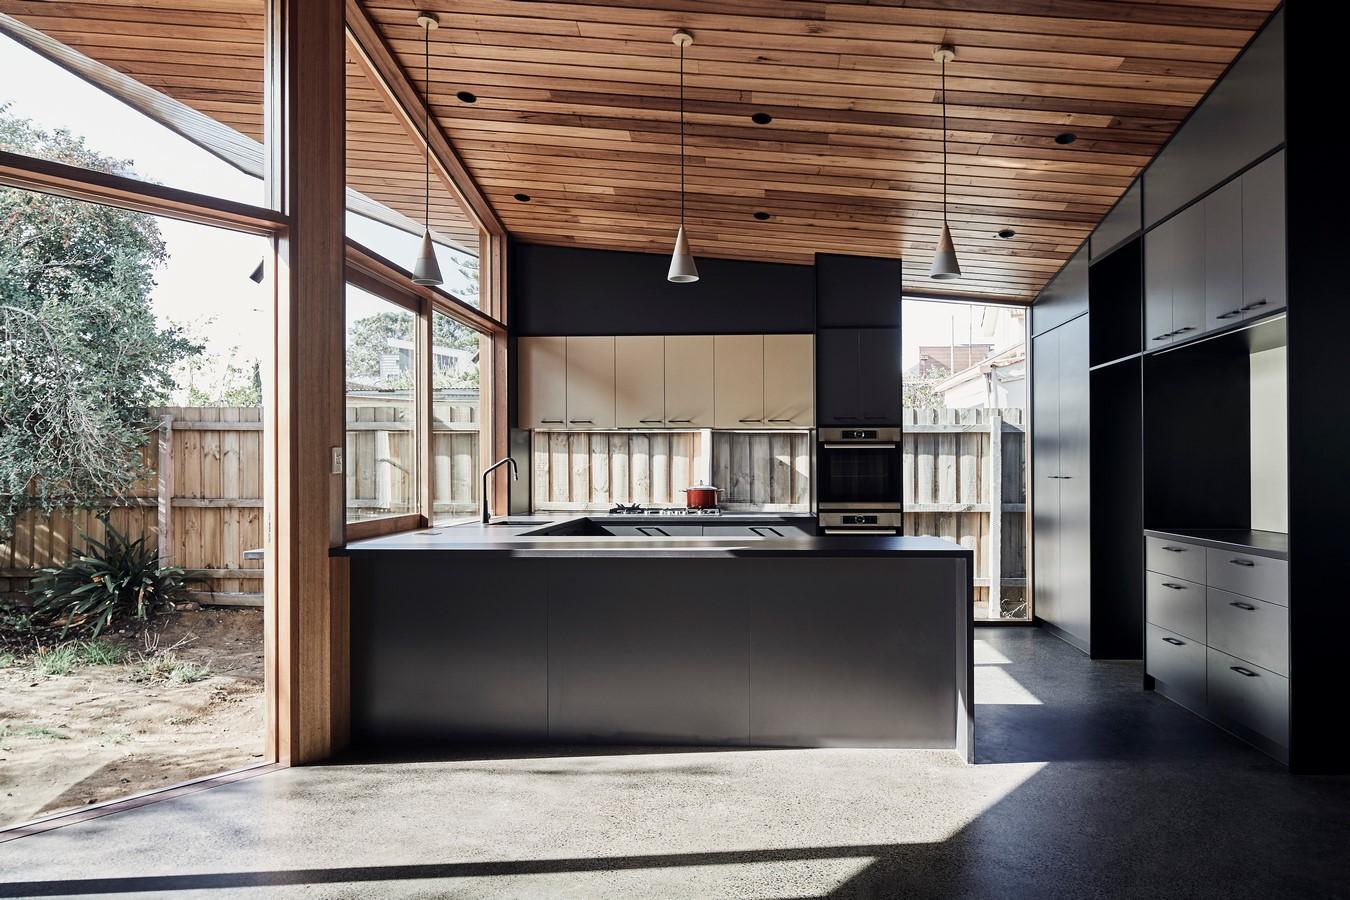 Barton House By Julie Firkin Architects - Sheet1